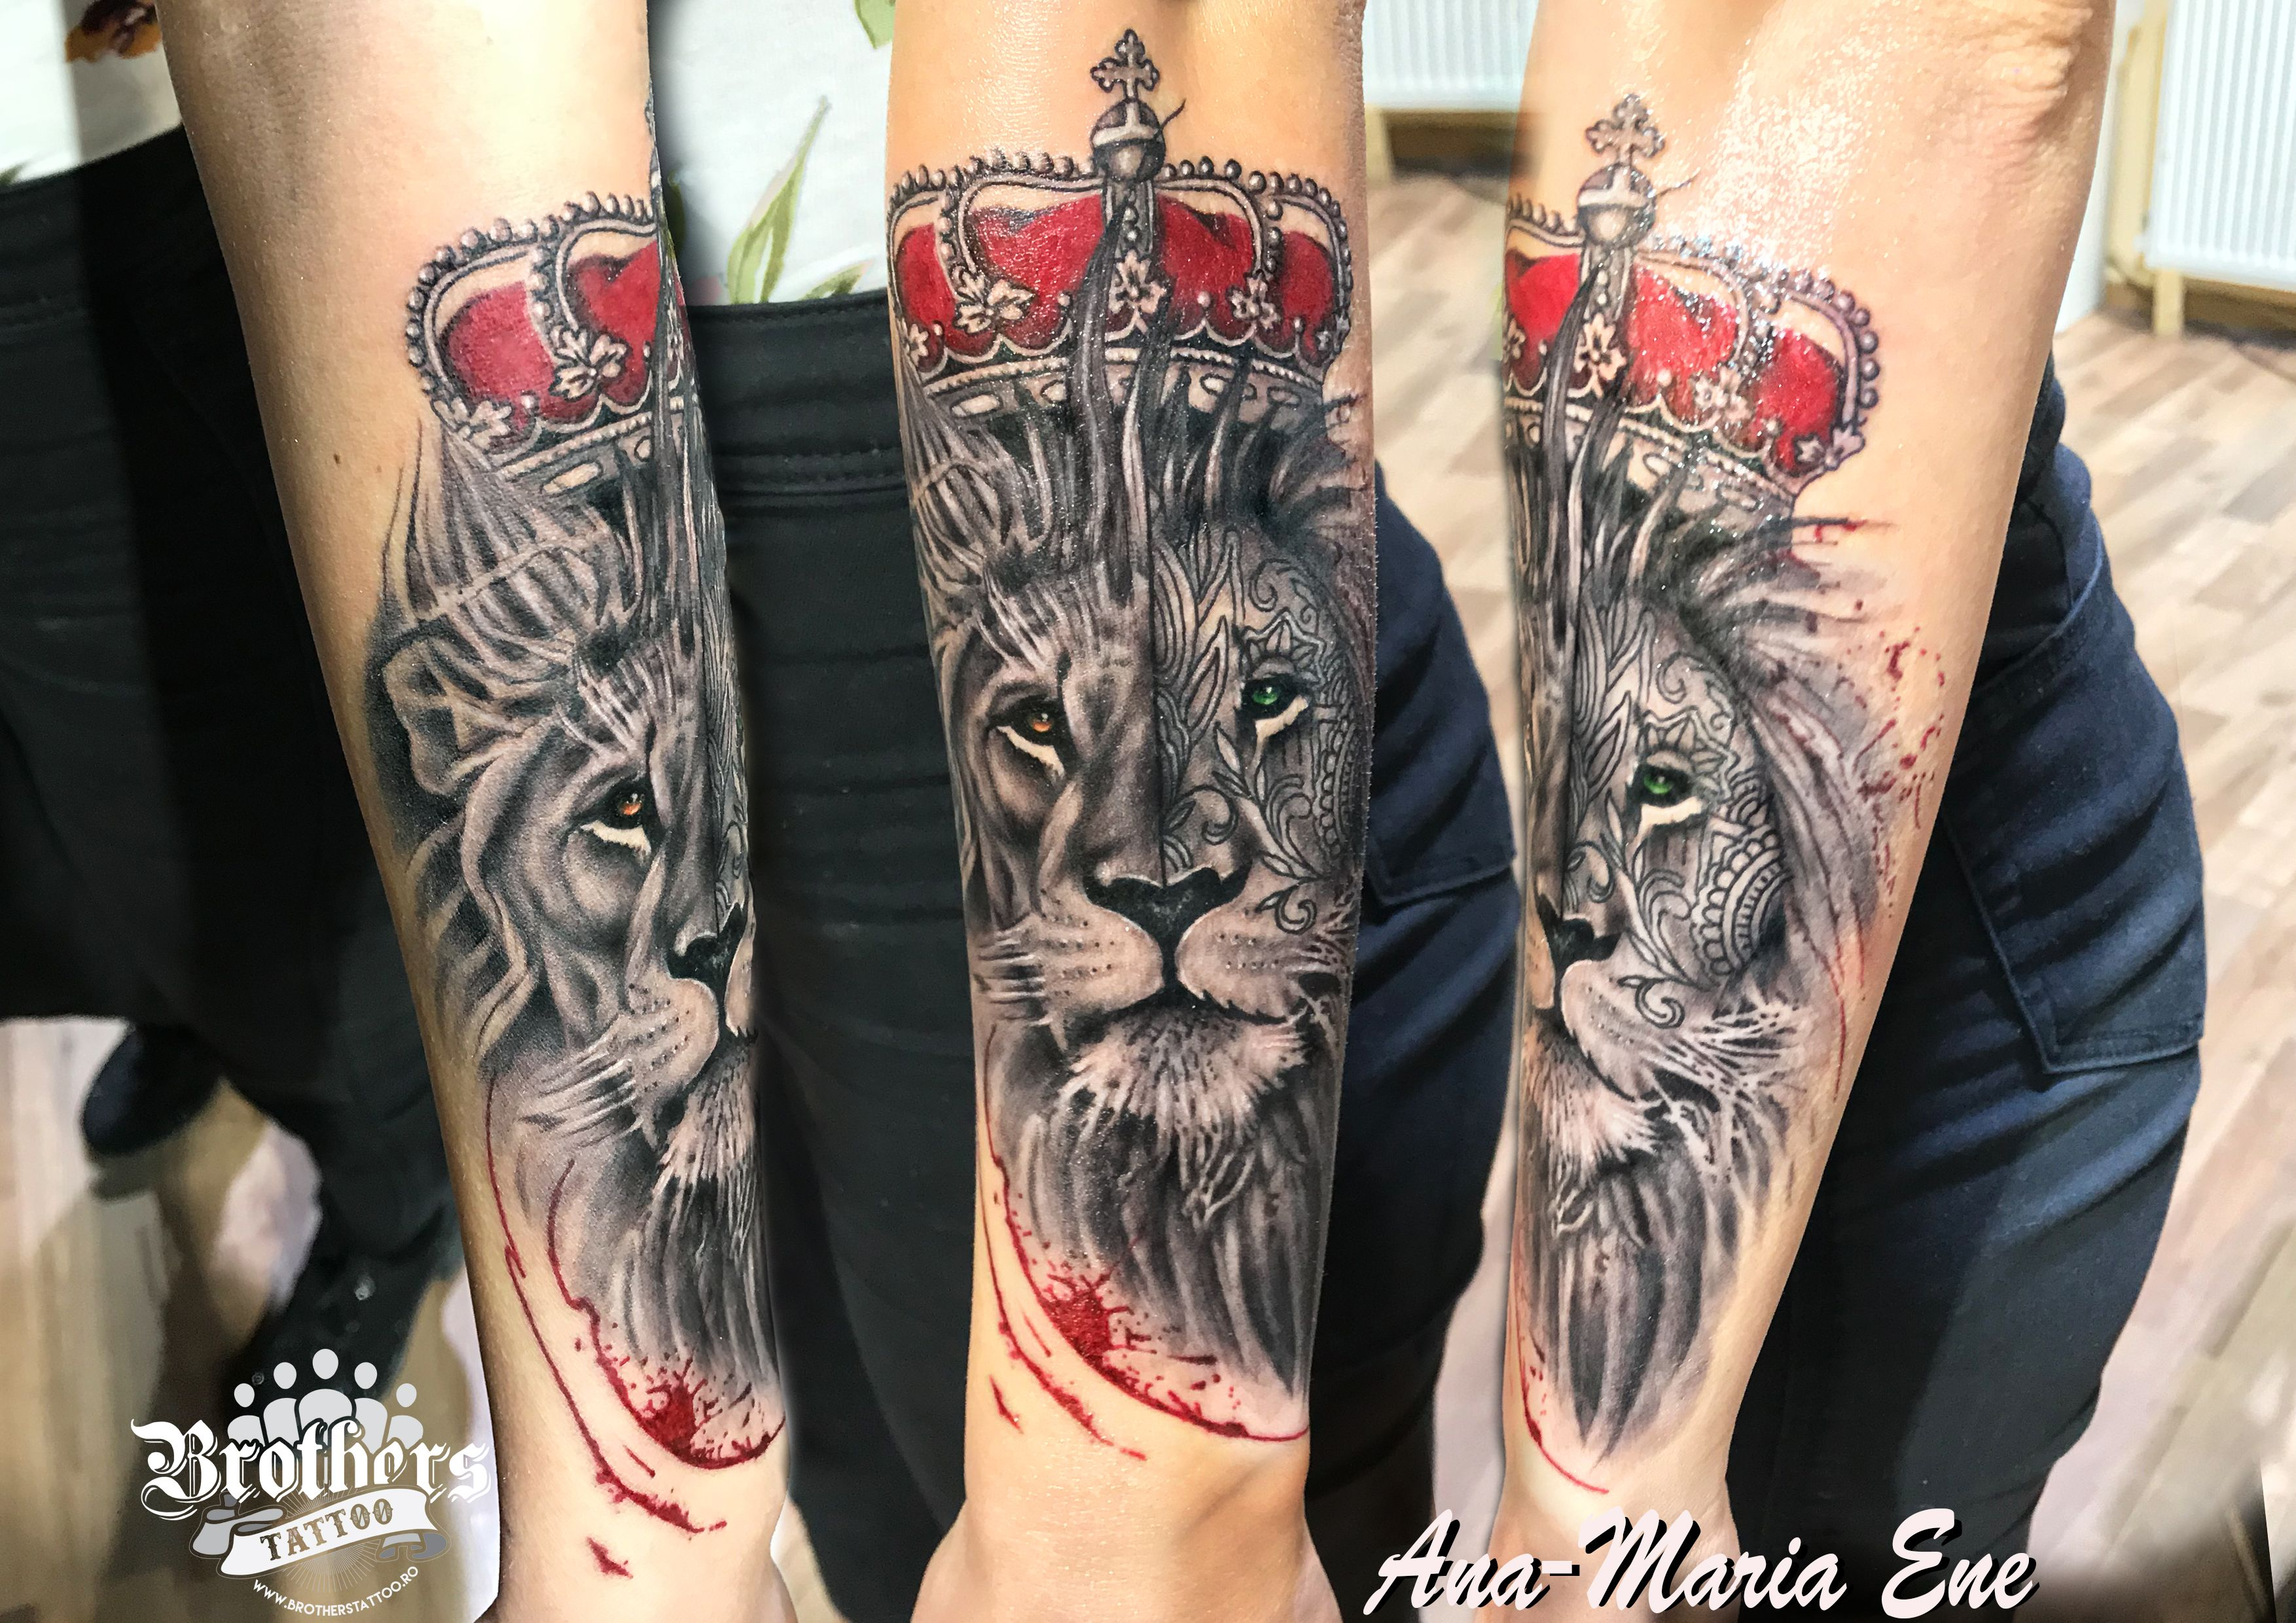 Brothers Tattoo Bucuresti Salon Tatuaje Bucuresti Tattoo Studio